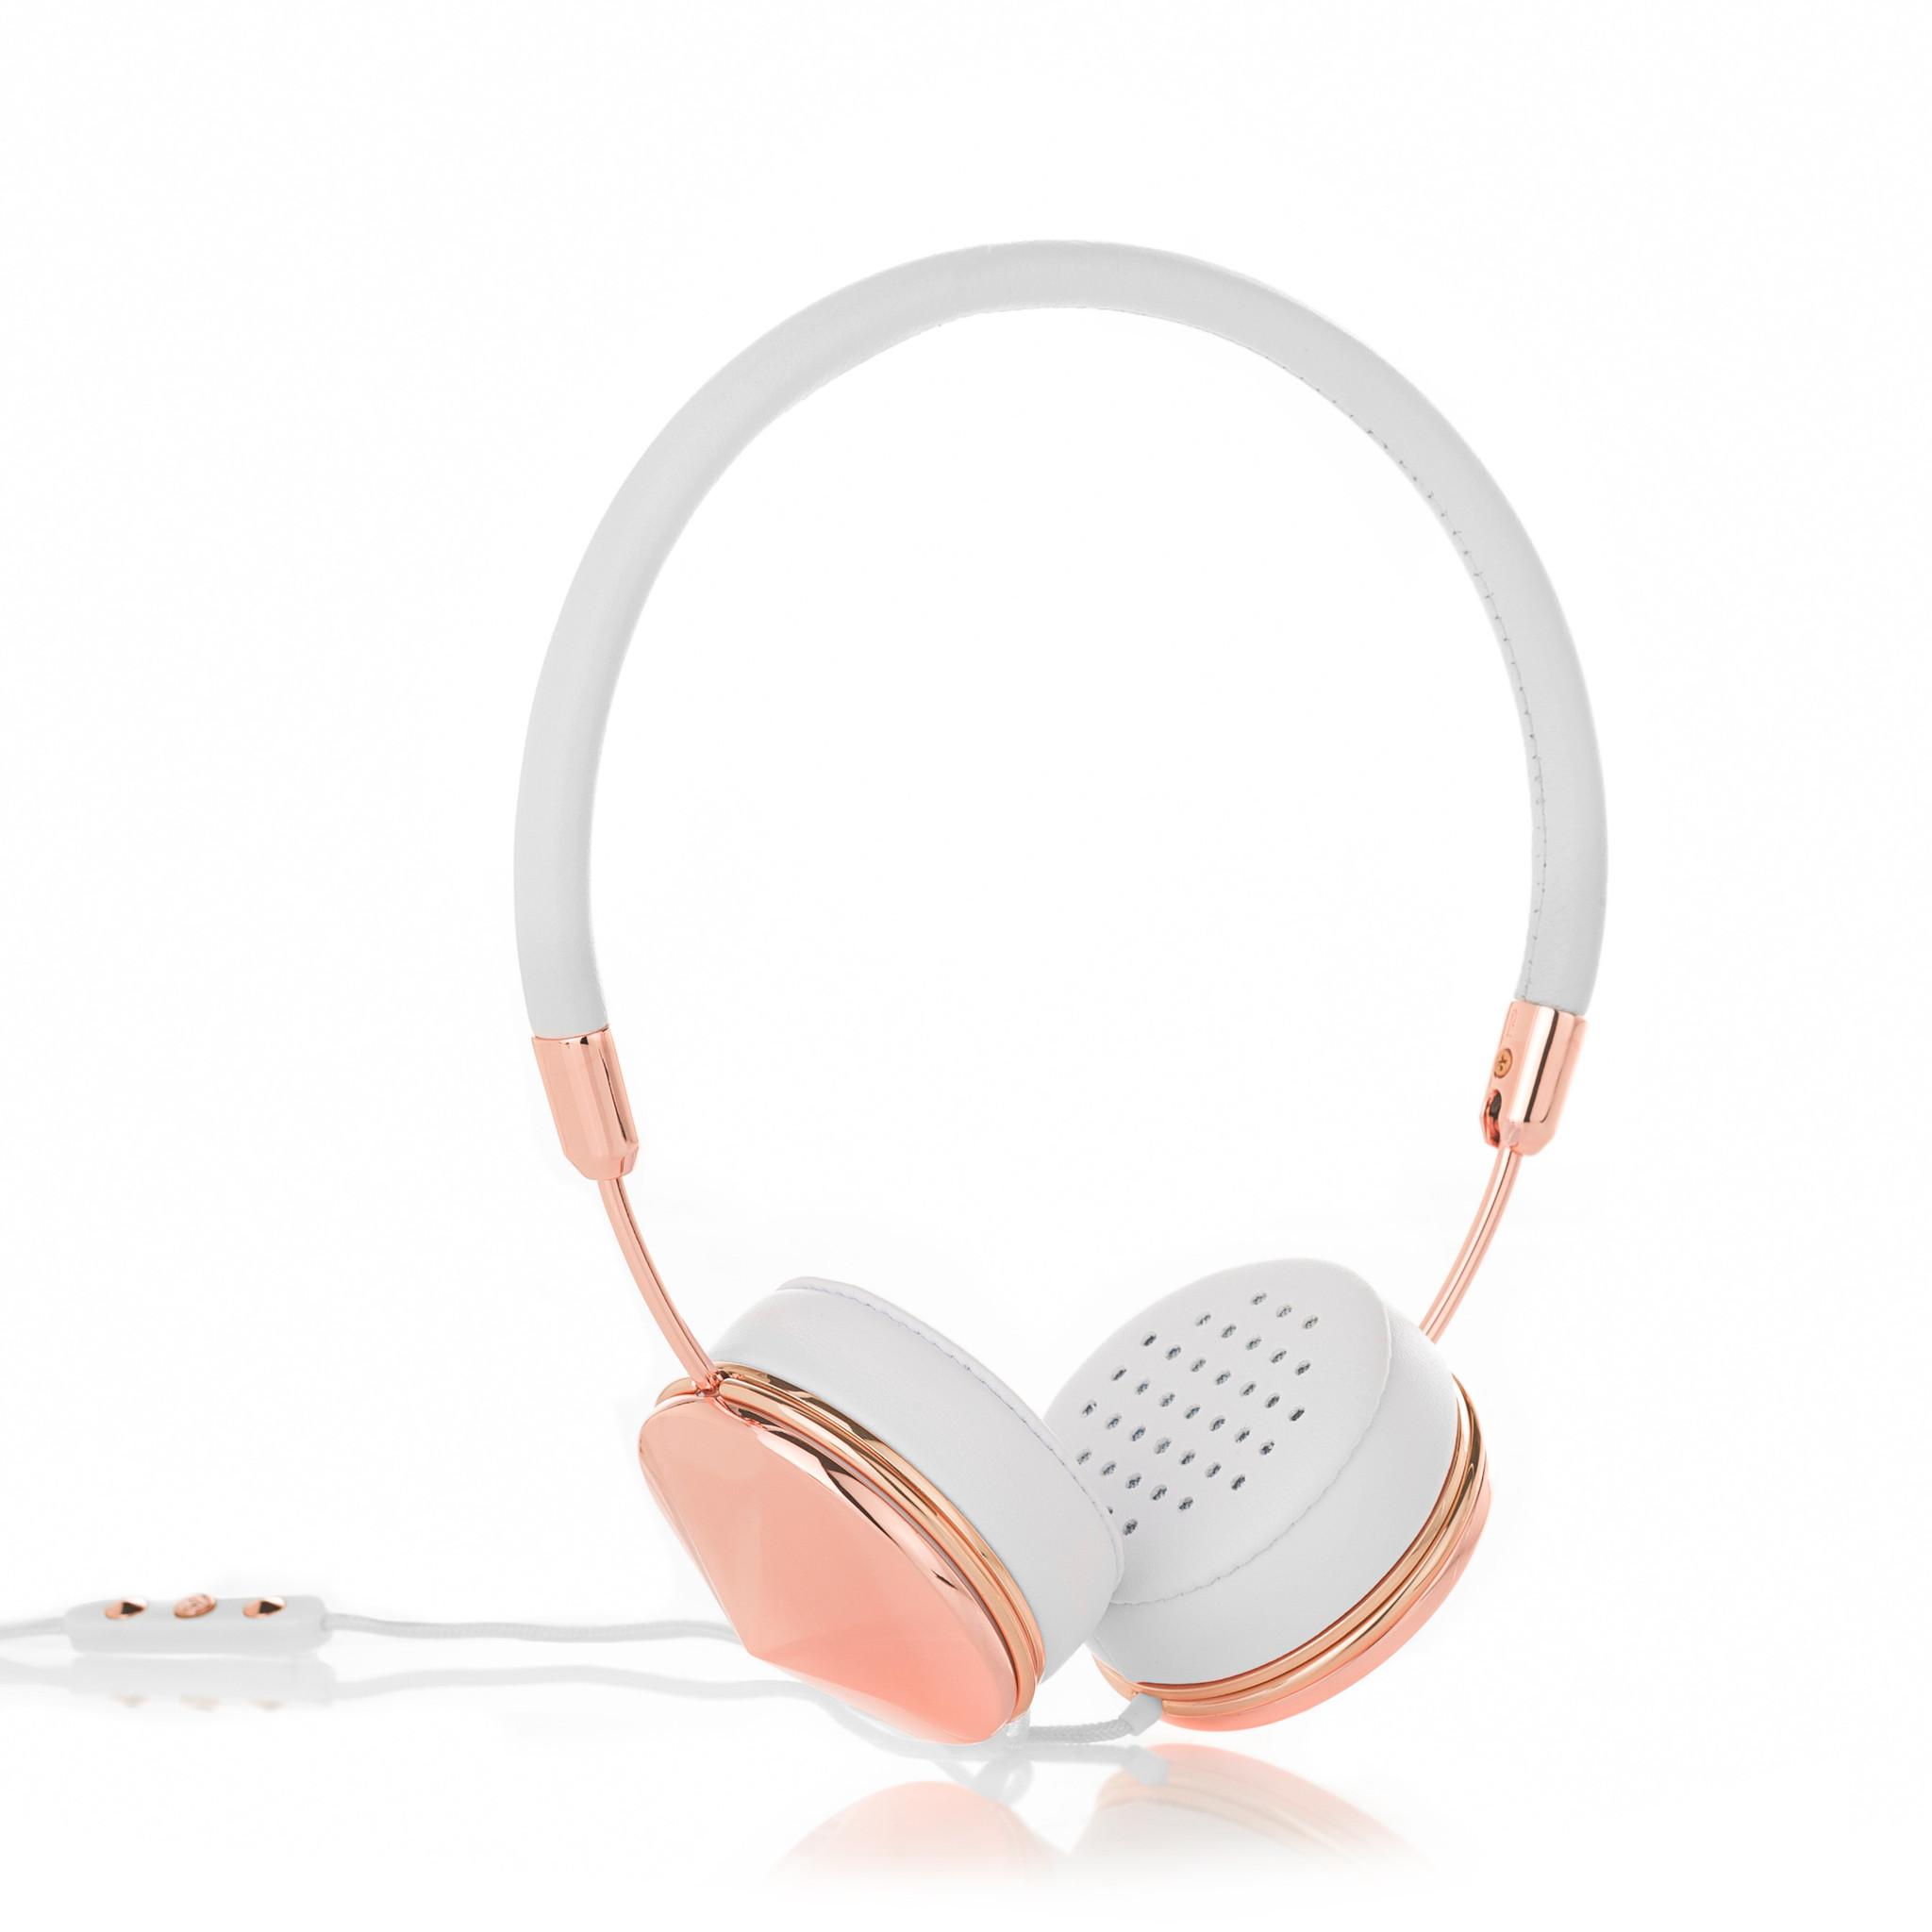 creative Headphone design and concept 2